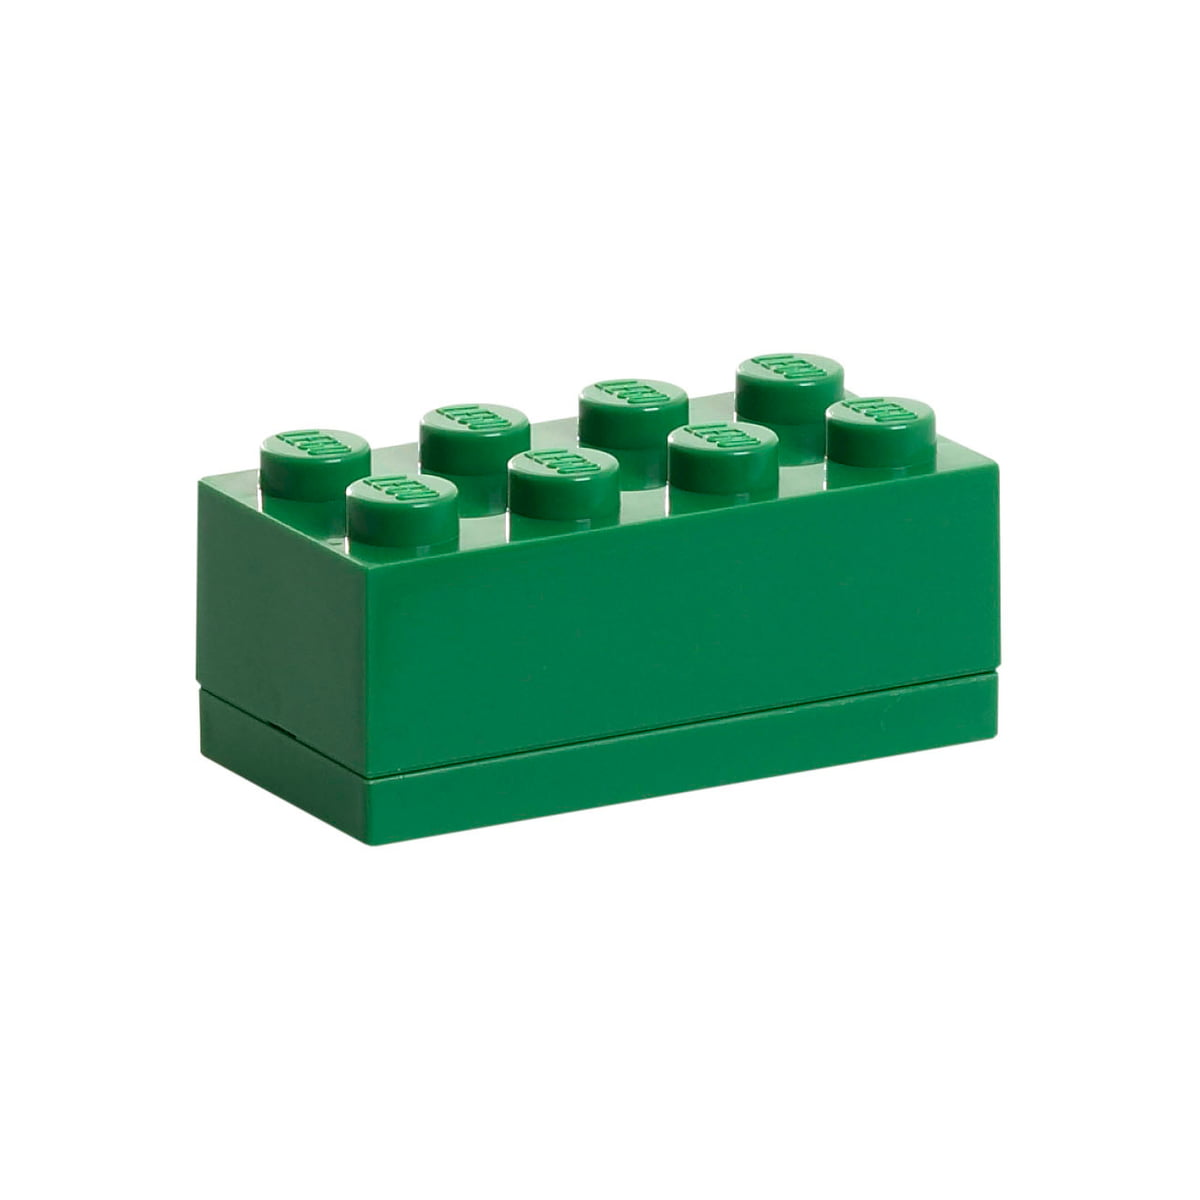 Lego - Mini-Box 8, dunkelgrün   Kinderzimmer > Spielzeuge > Sonstige Spielzeuge   Grün   Polypropylen   Lego